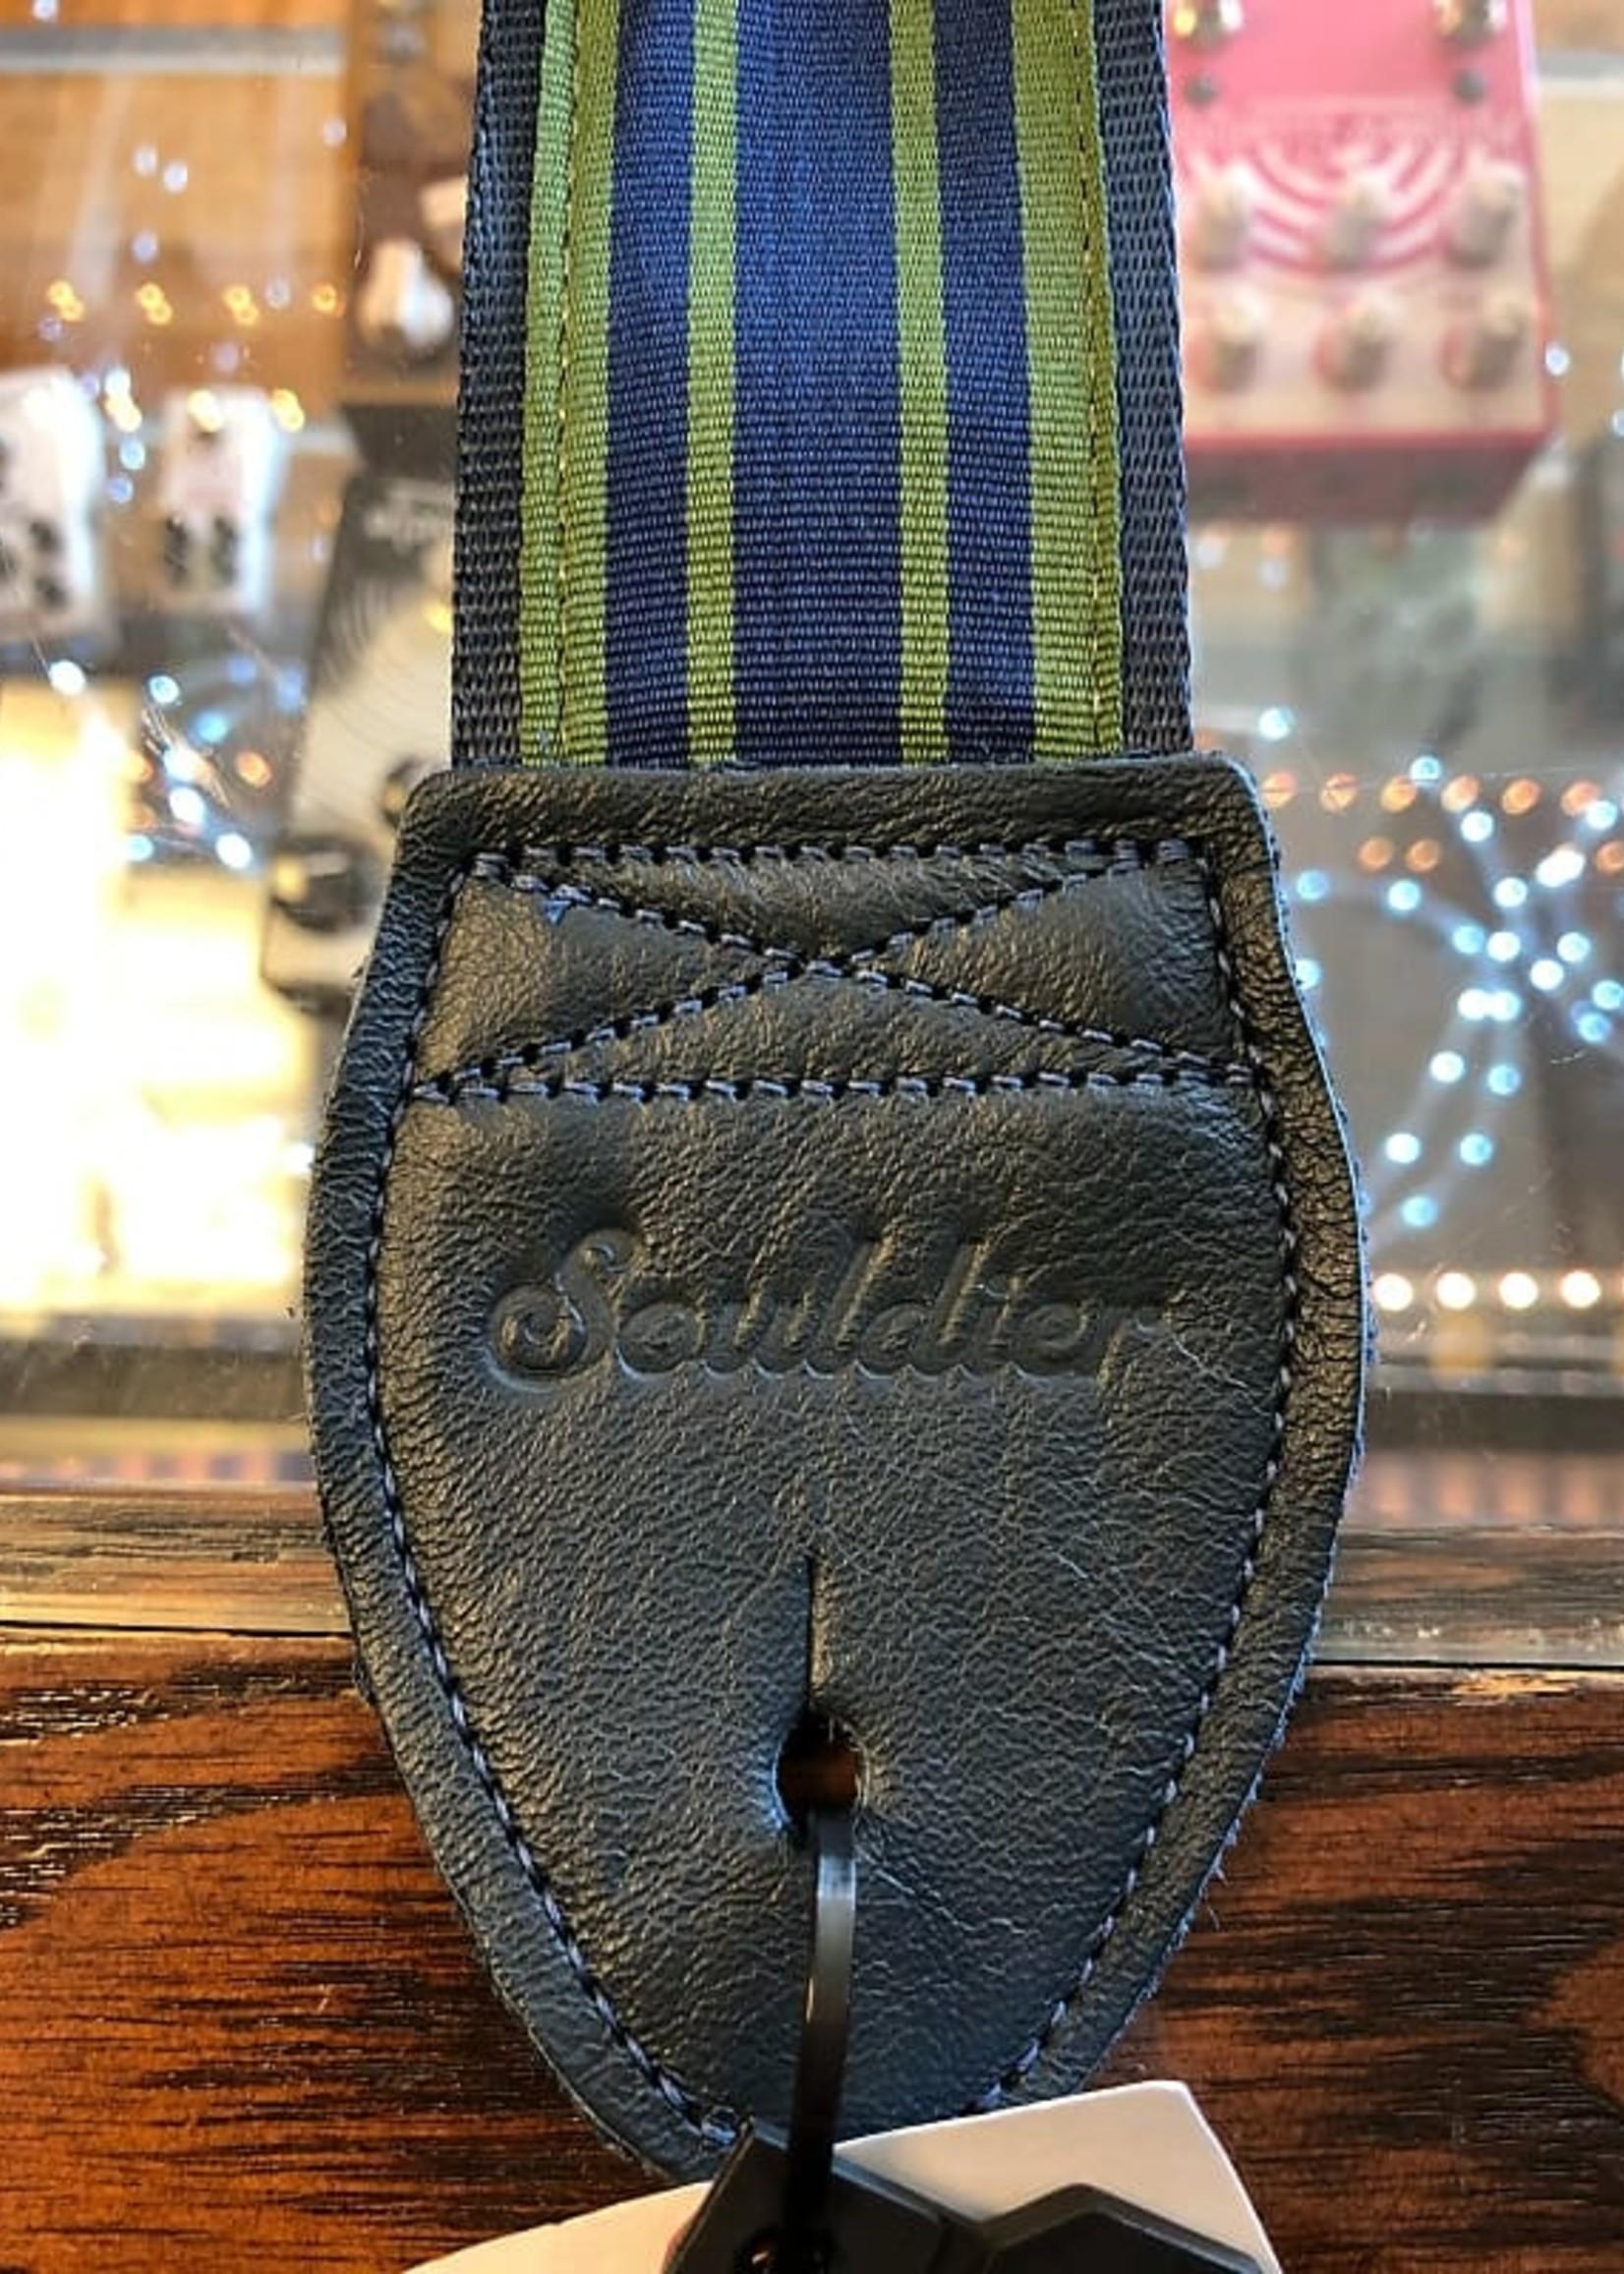 Souldier Souldier Shelby Stripe NV/FG